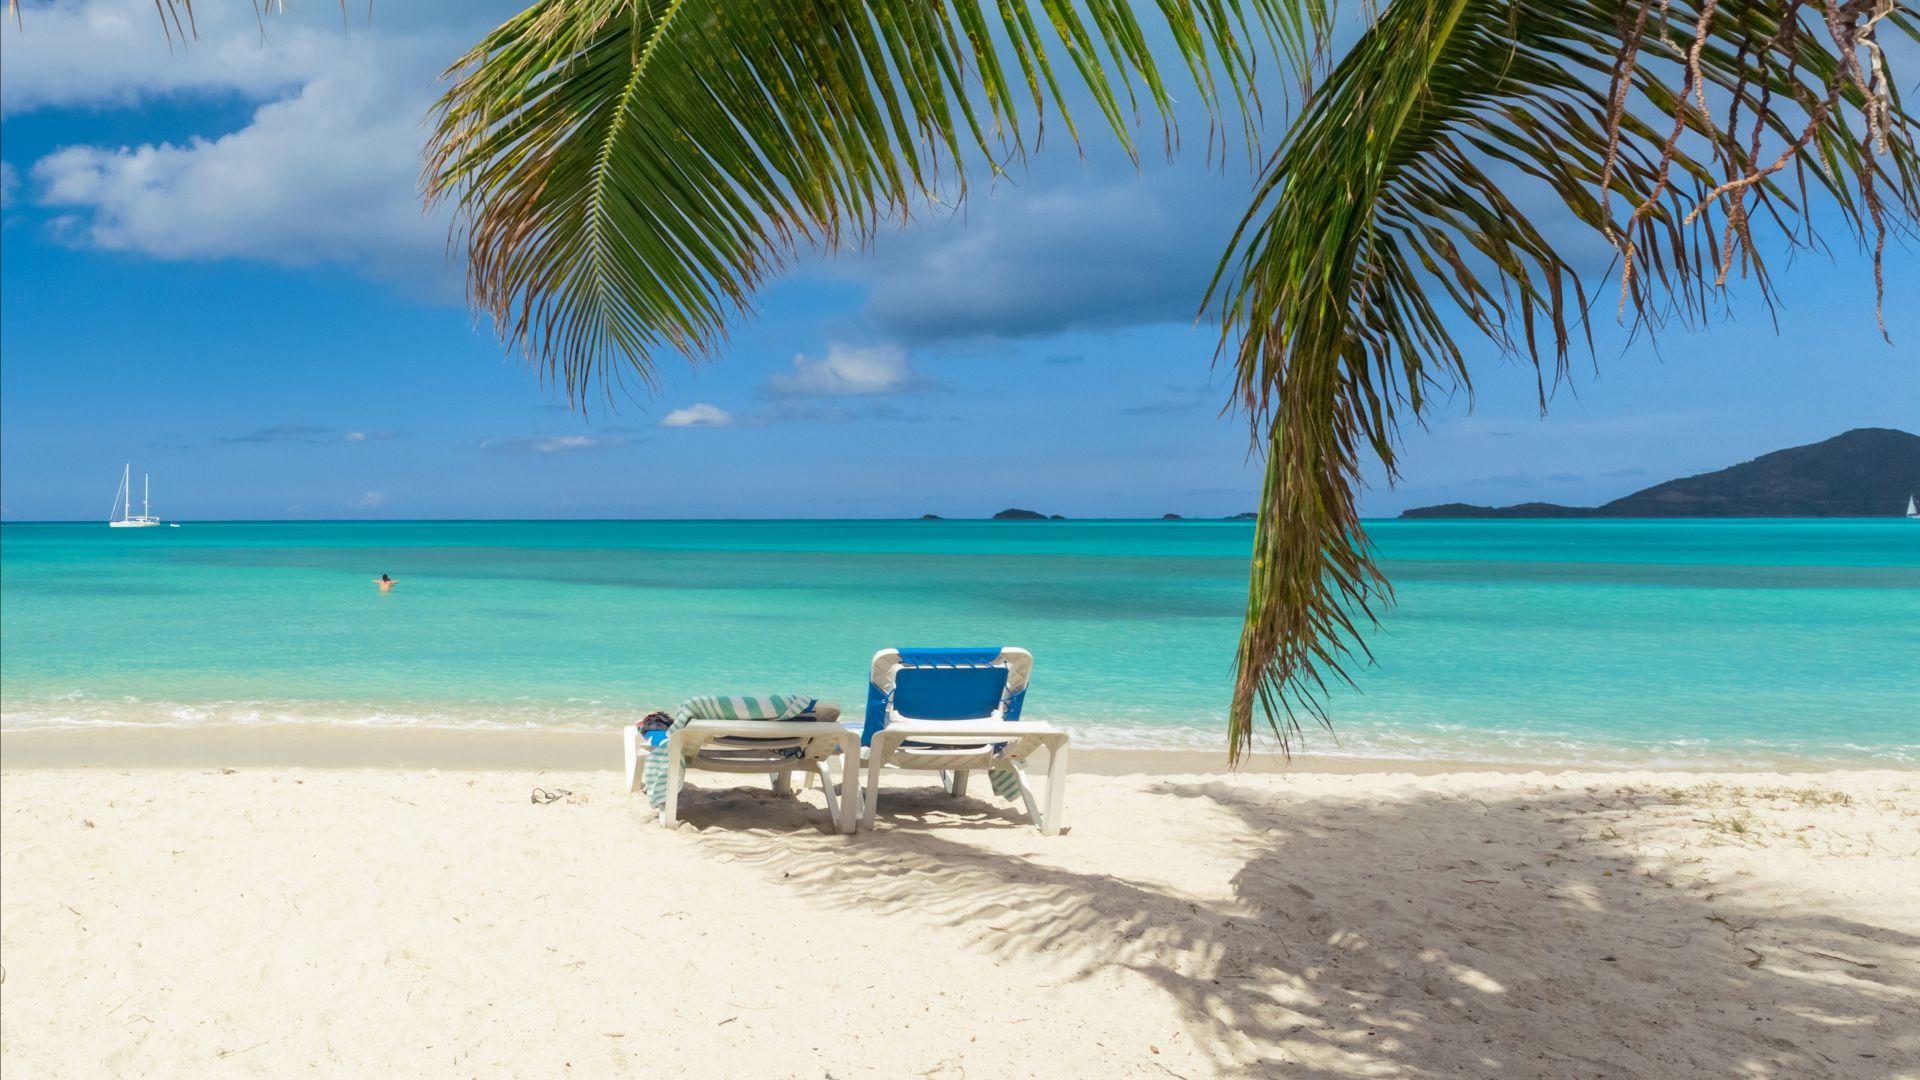 Shore Palms Tropical Beach 4k Hd Desktop Wallpaper For 4k: Wallpaper Thailand, Beach, Sea, Shore, Sand, Palms, Travel